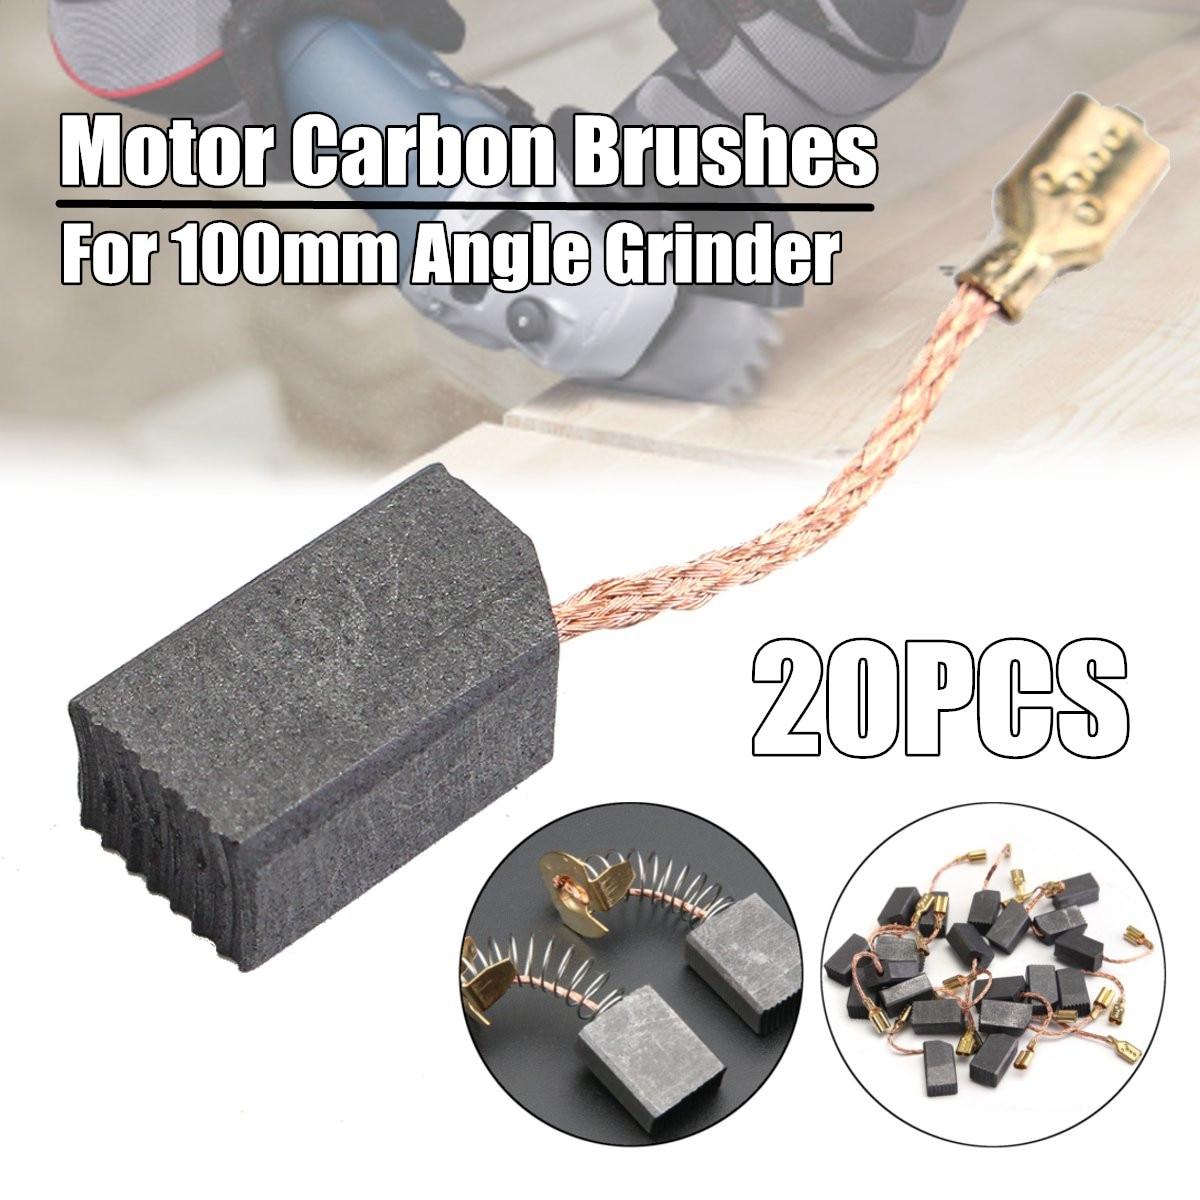 Conjunto de escovas de carbono, motor de grafite, fio de cobre apertado para martelo elétrico/broca para dewalt 100mm, 20 peças moedor de ângulo